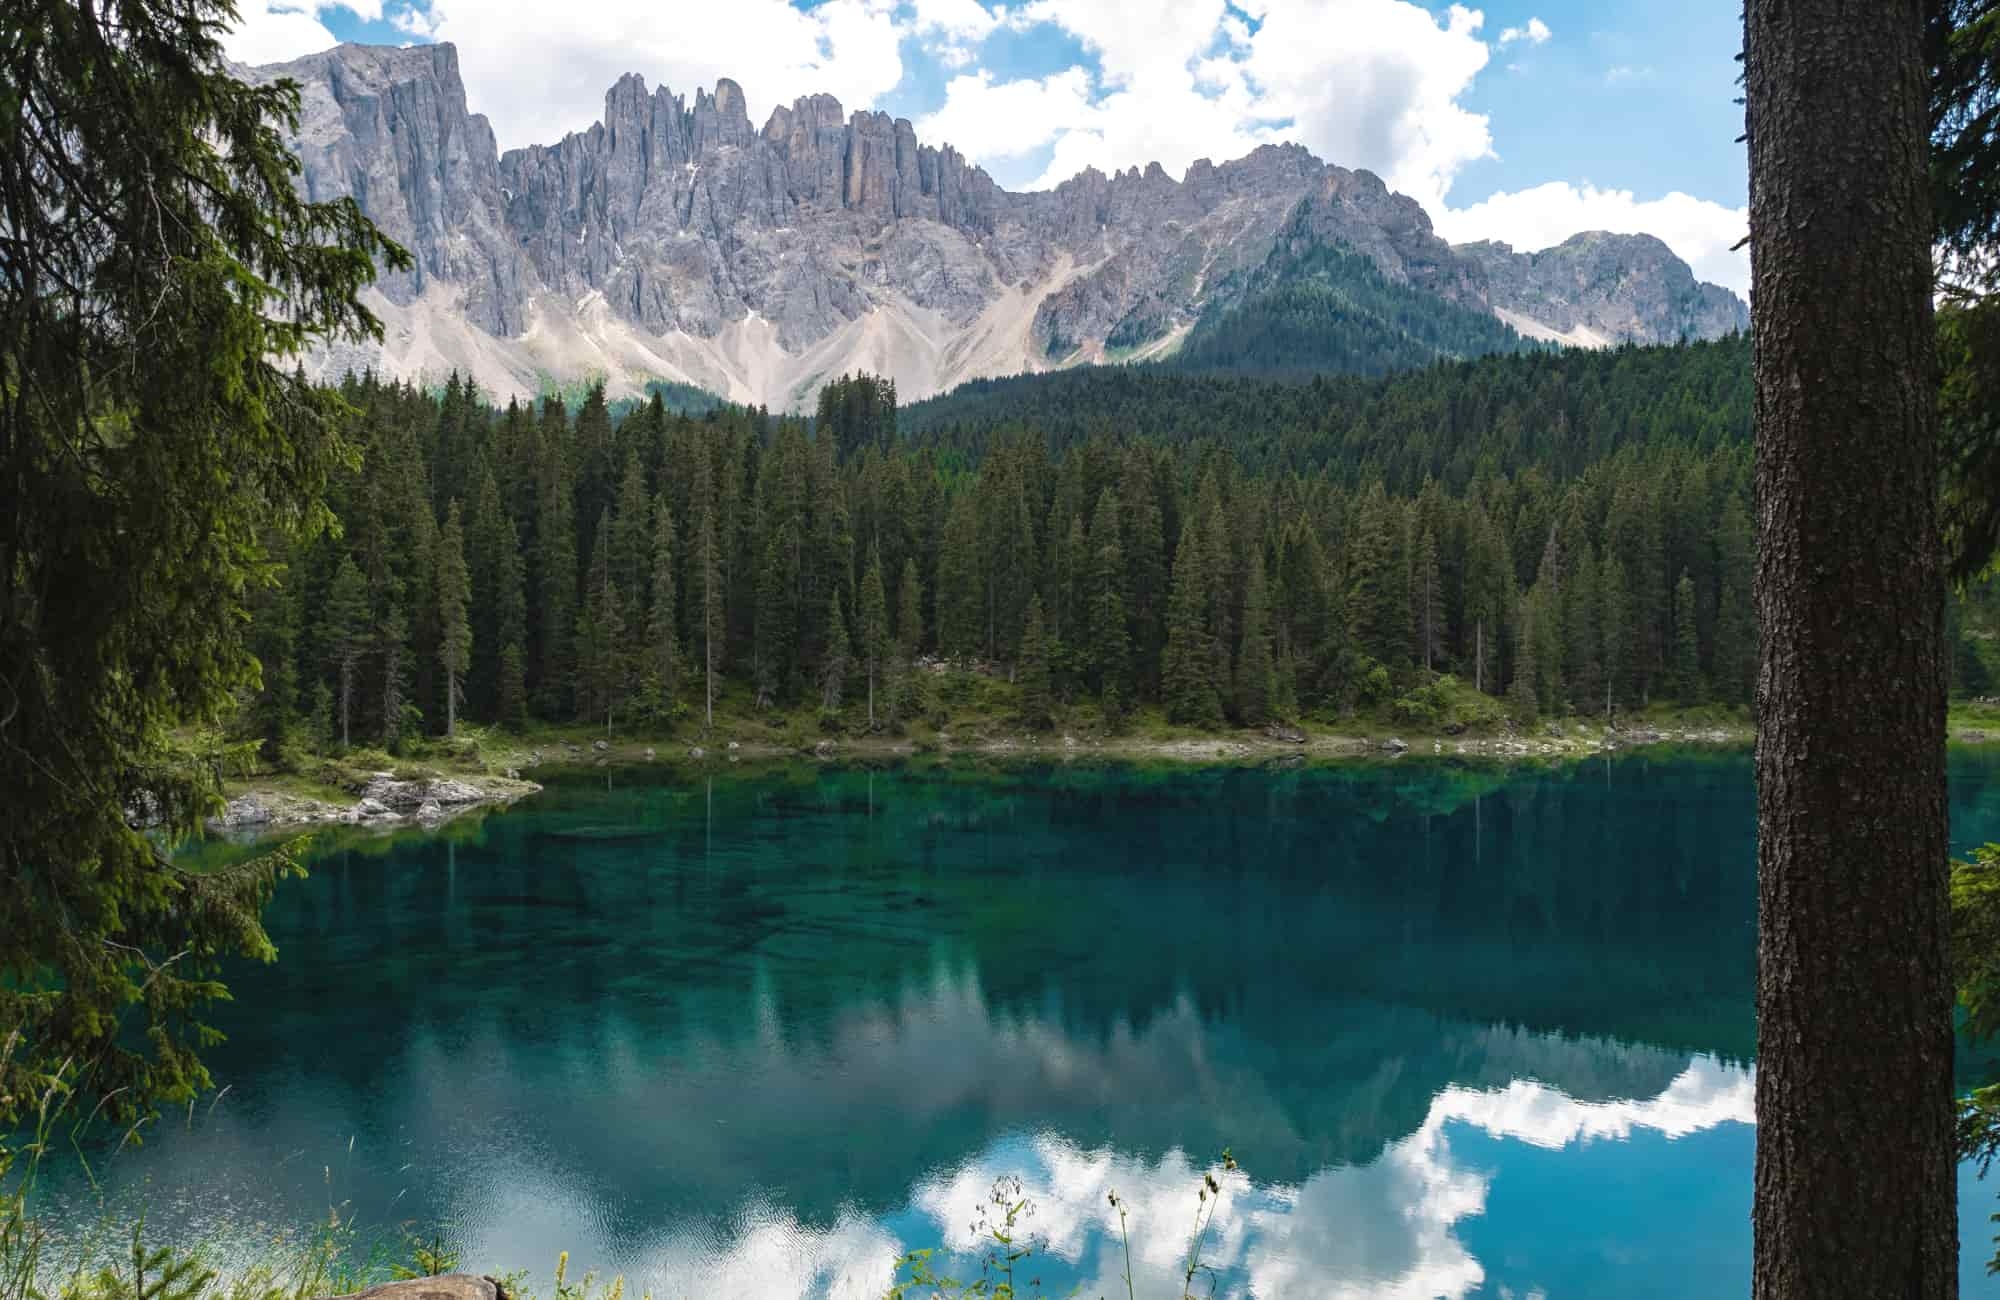 Voyage Italie - Les dolomites - Amplitudes